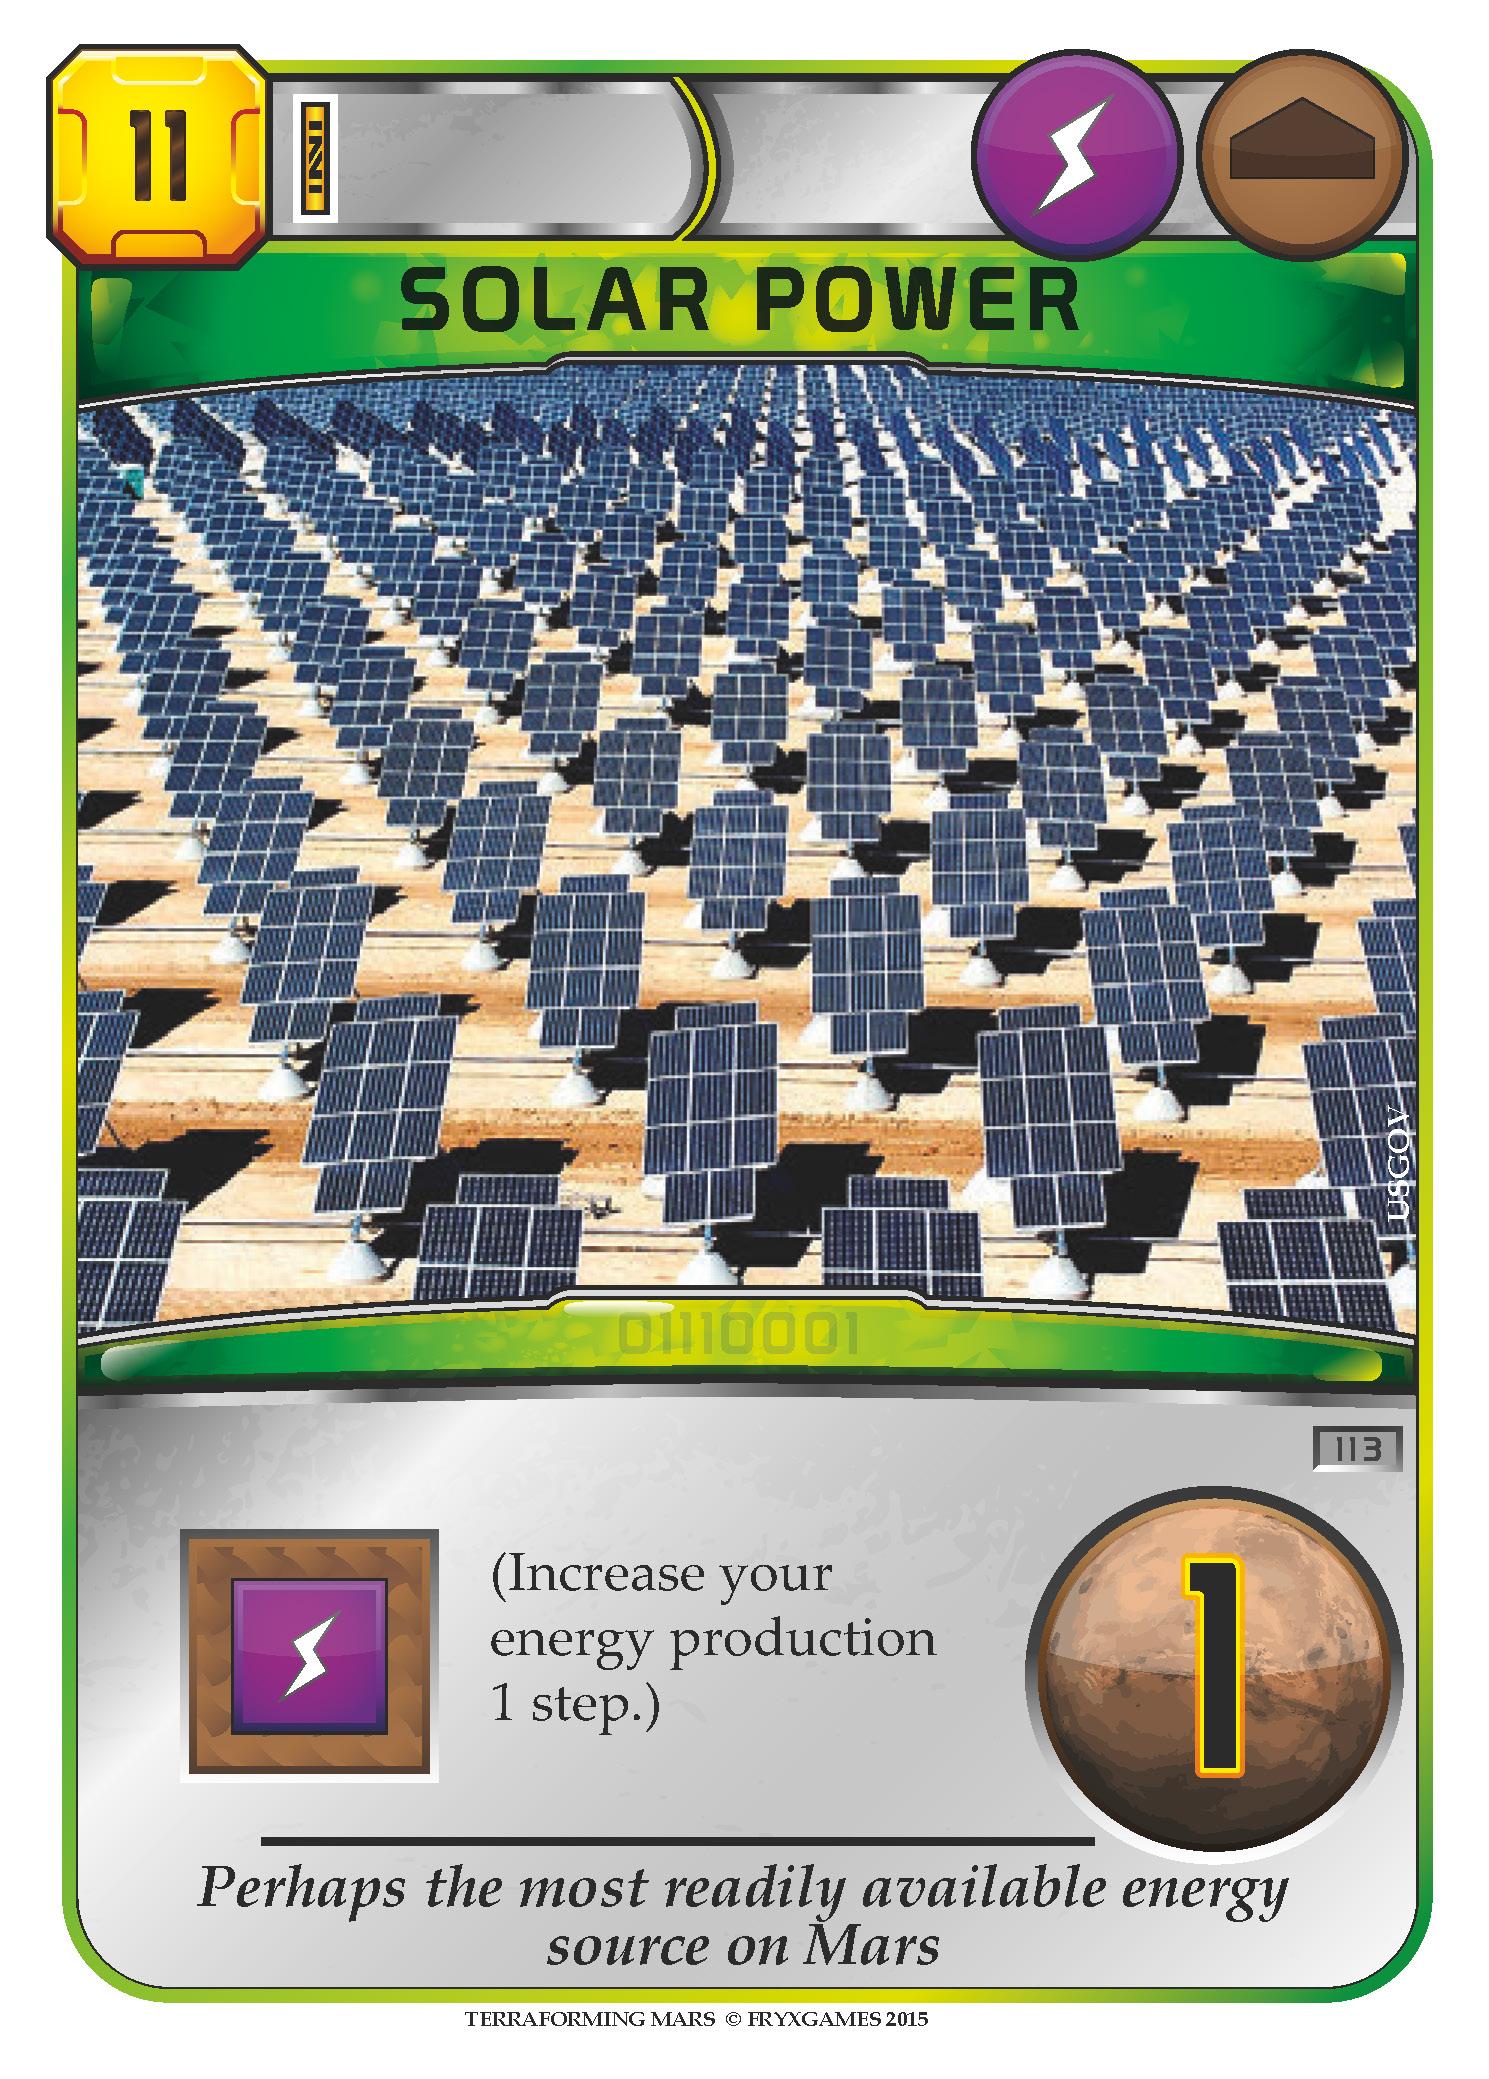 Terraforming mars fryxgames for Solar energy games